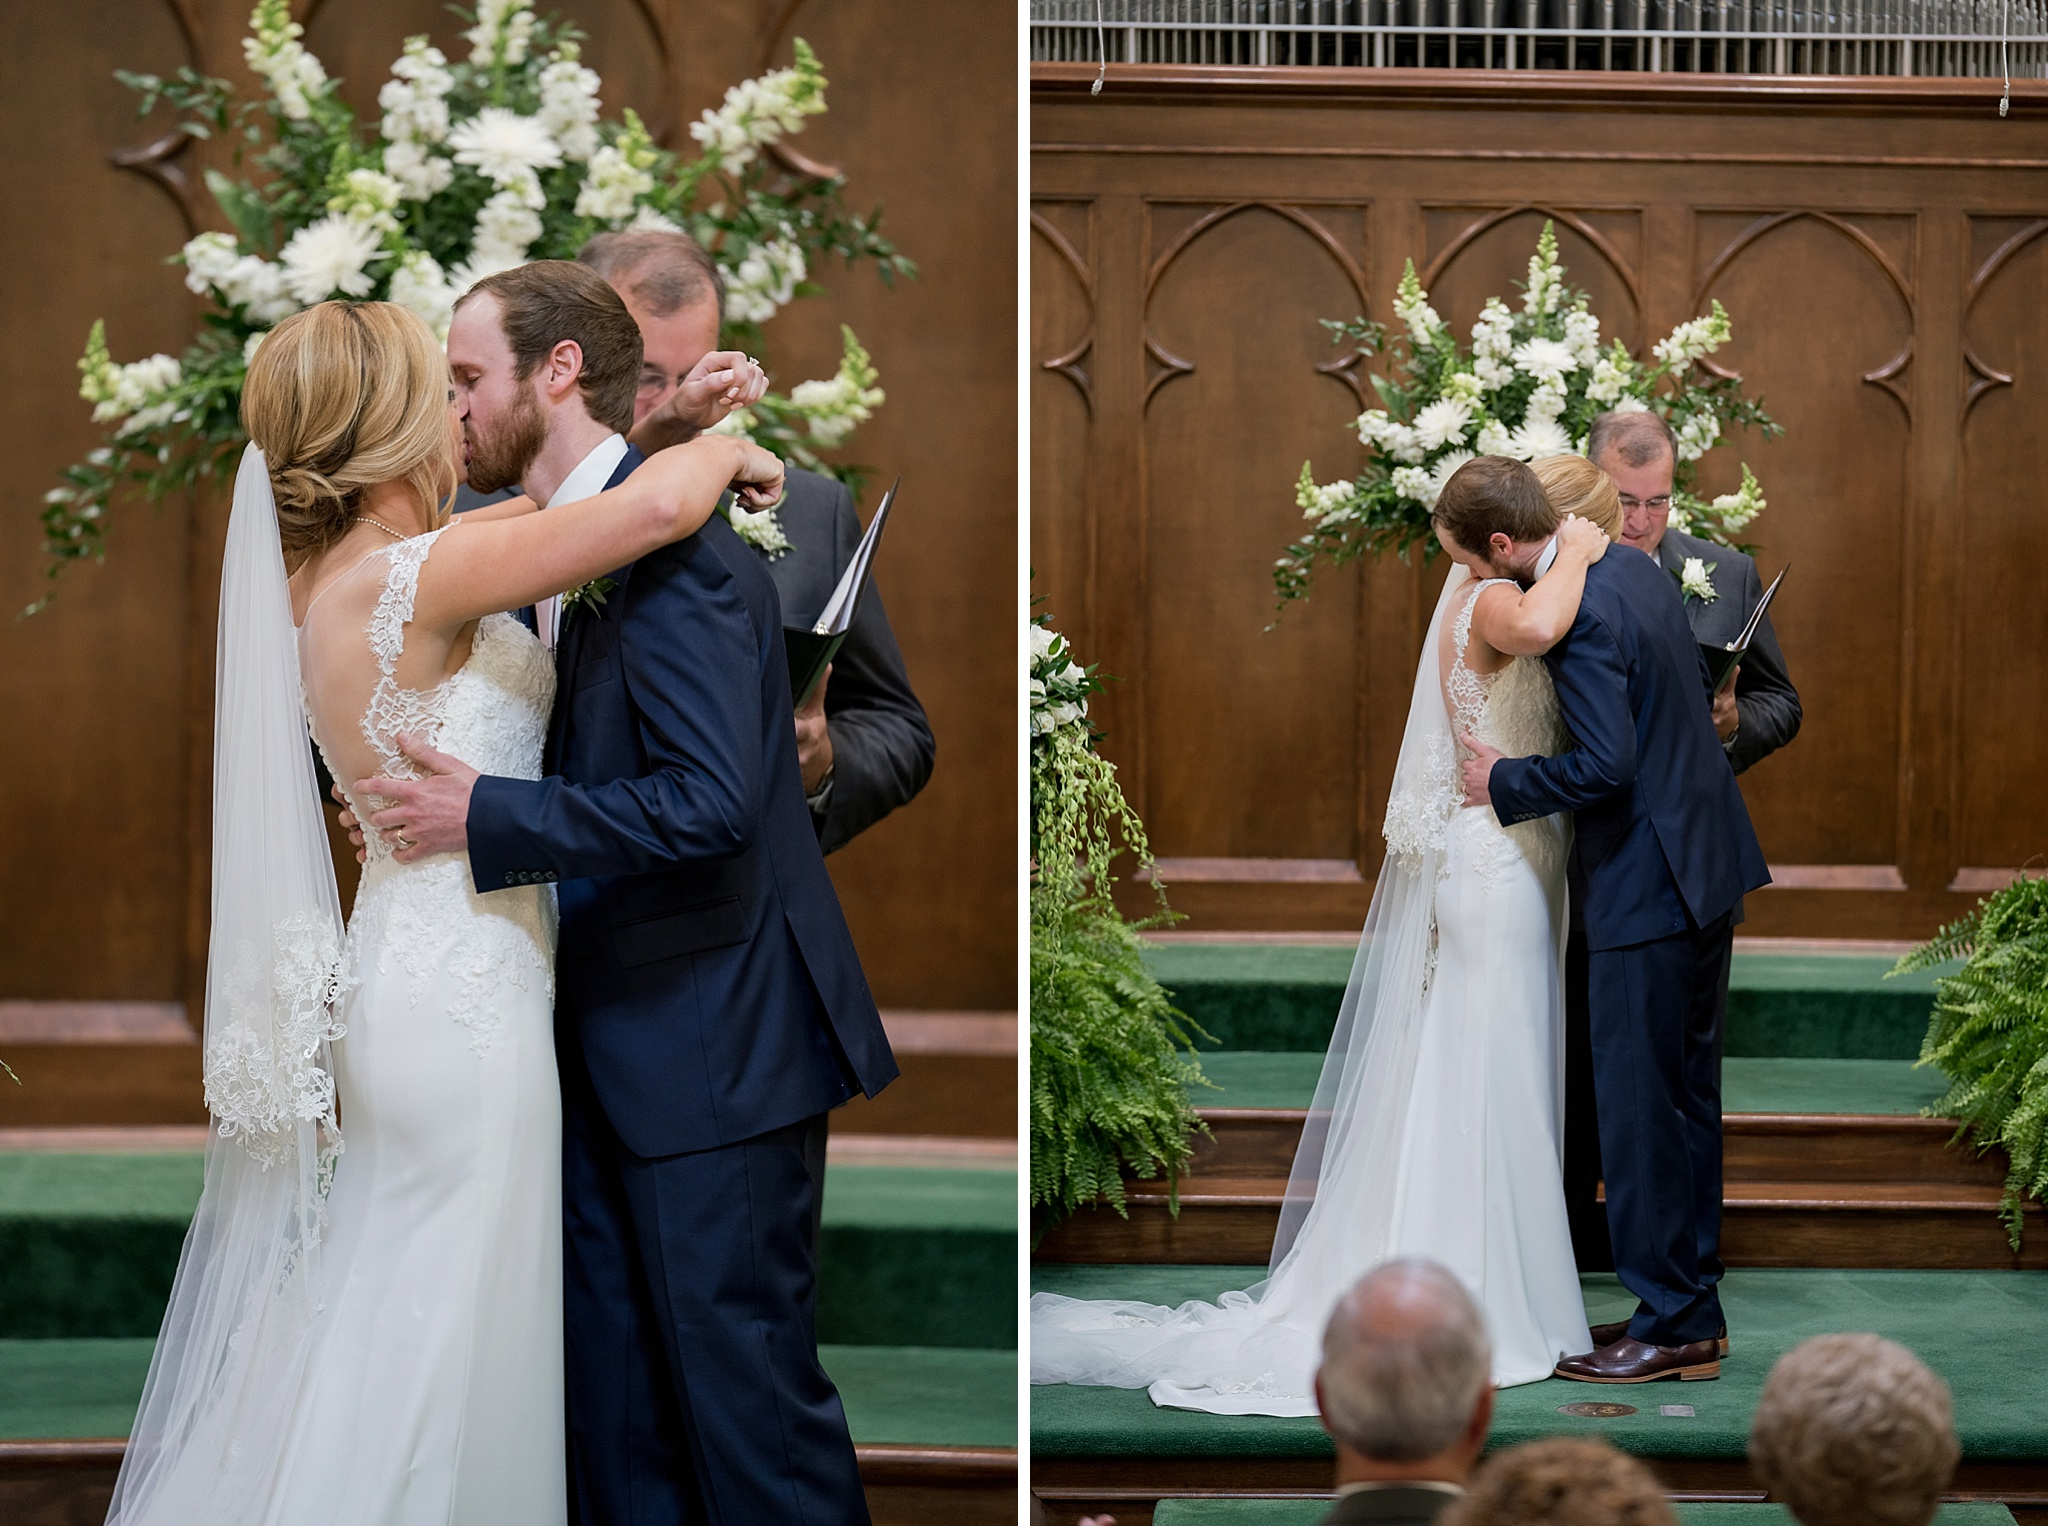 Williamston-NC-Wedding-Photographer-019.jpg